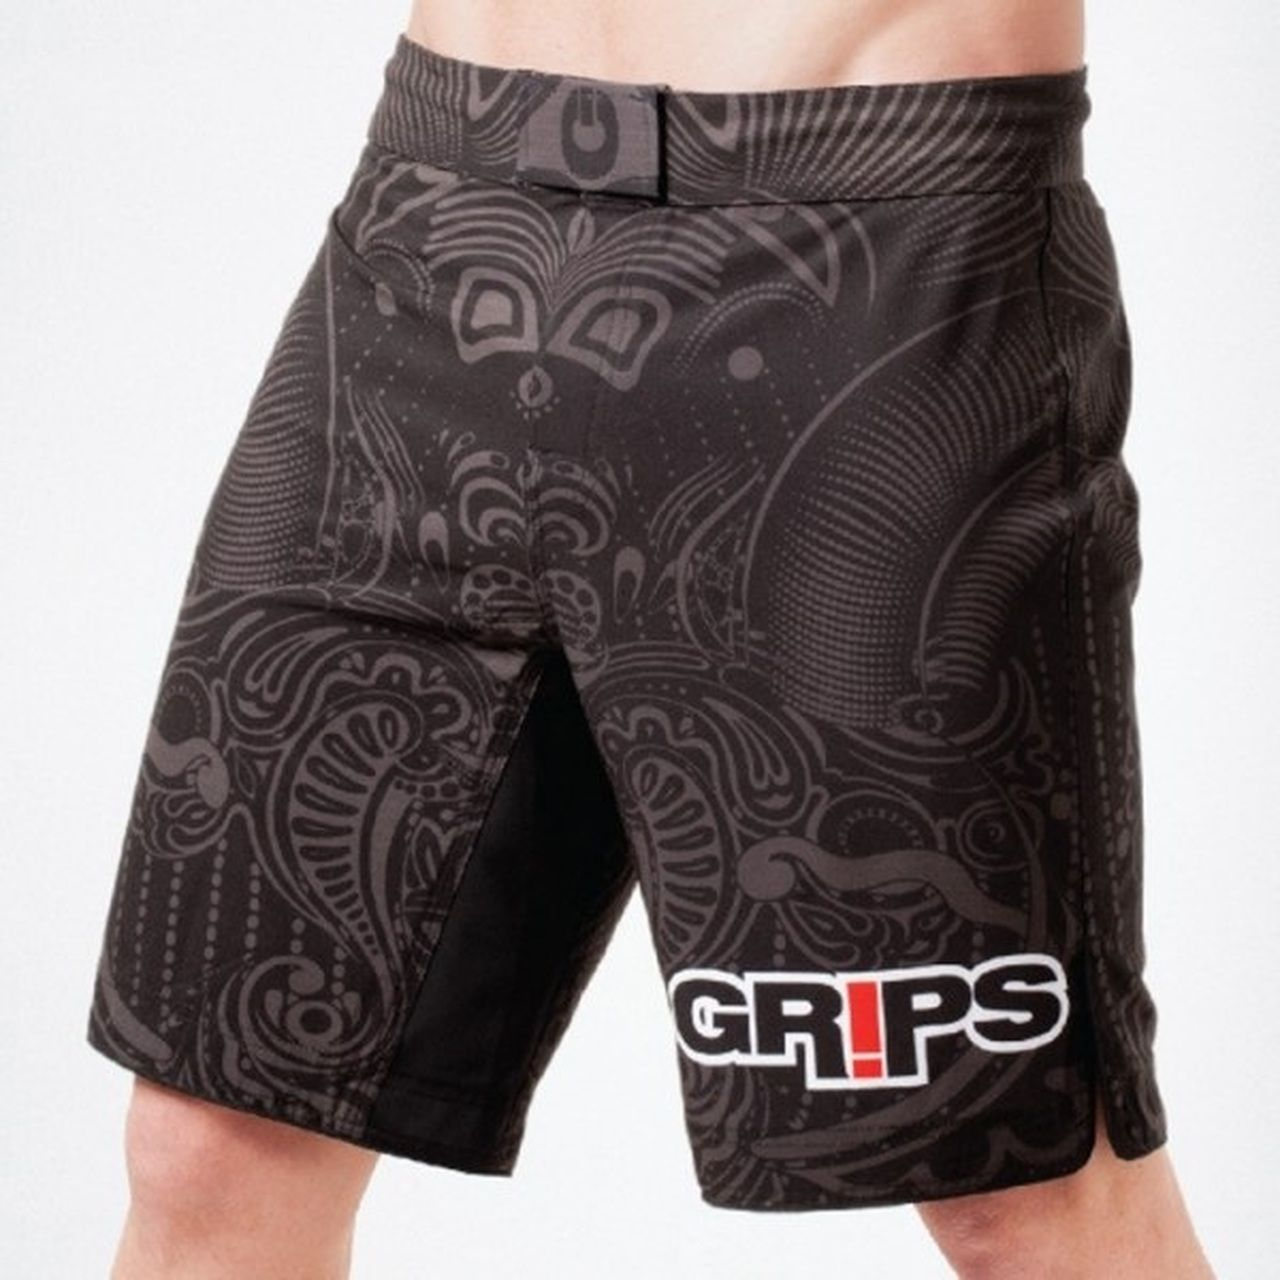 Grips Athletics Warriors Instinct Fight Shorts Black Fight Shorts Rashguard Black Long Sleeve Rashguard